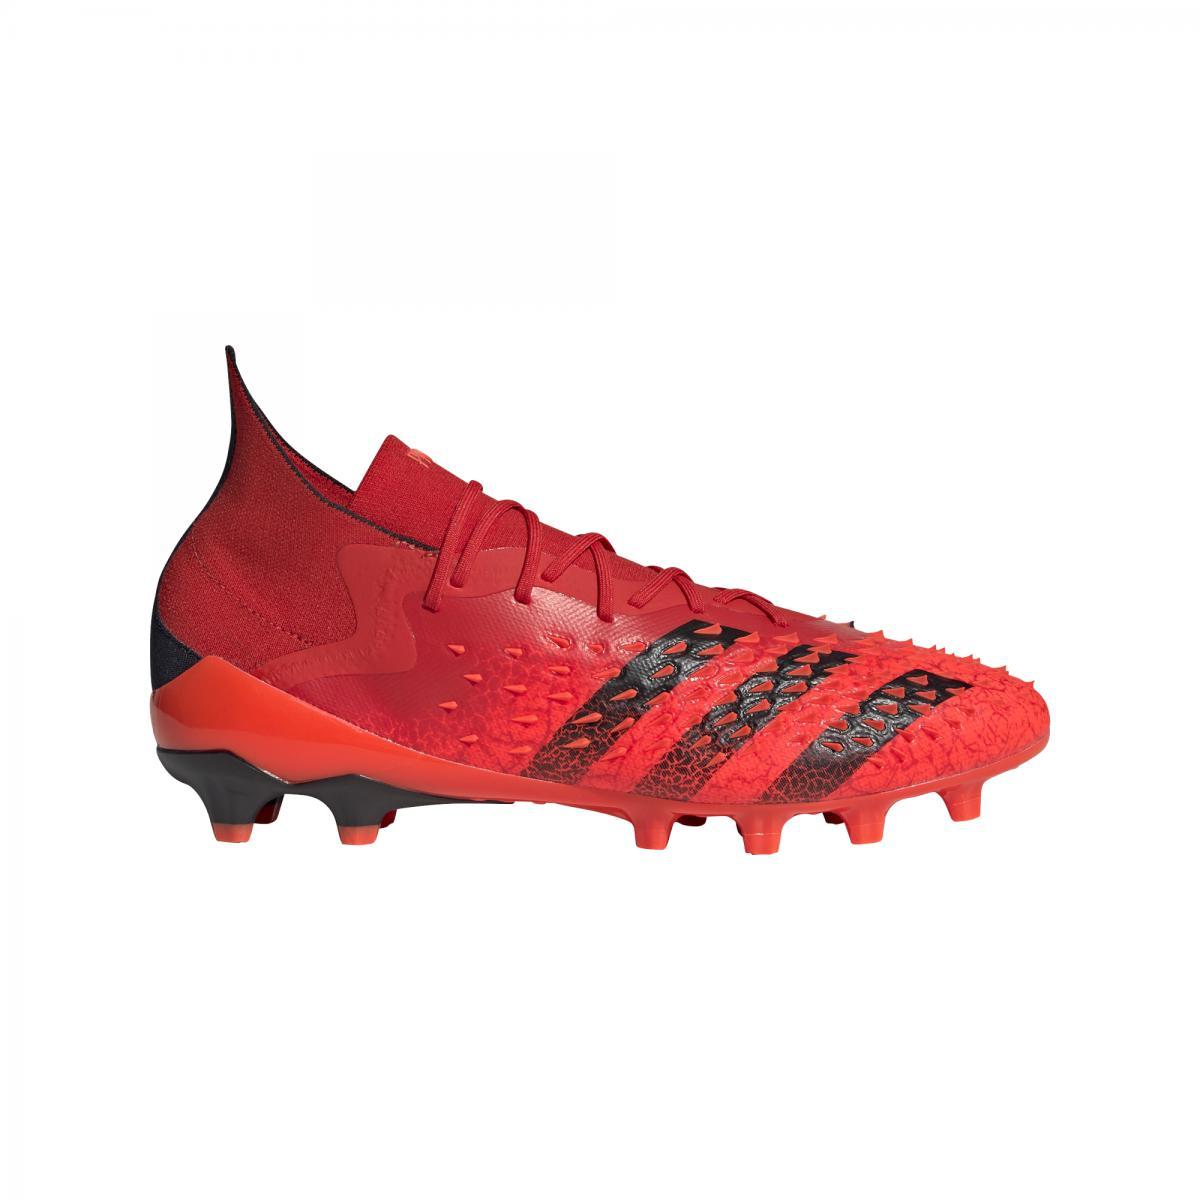 Adidas  Predator Freak .1 Ag